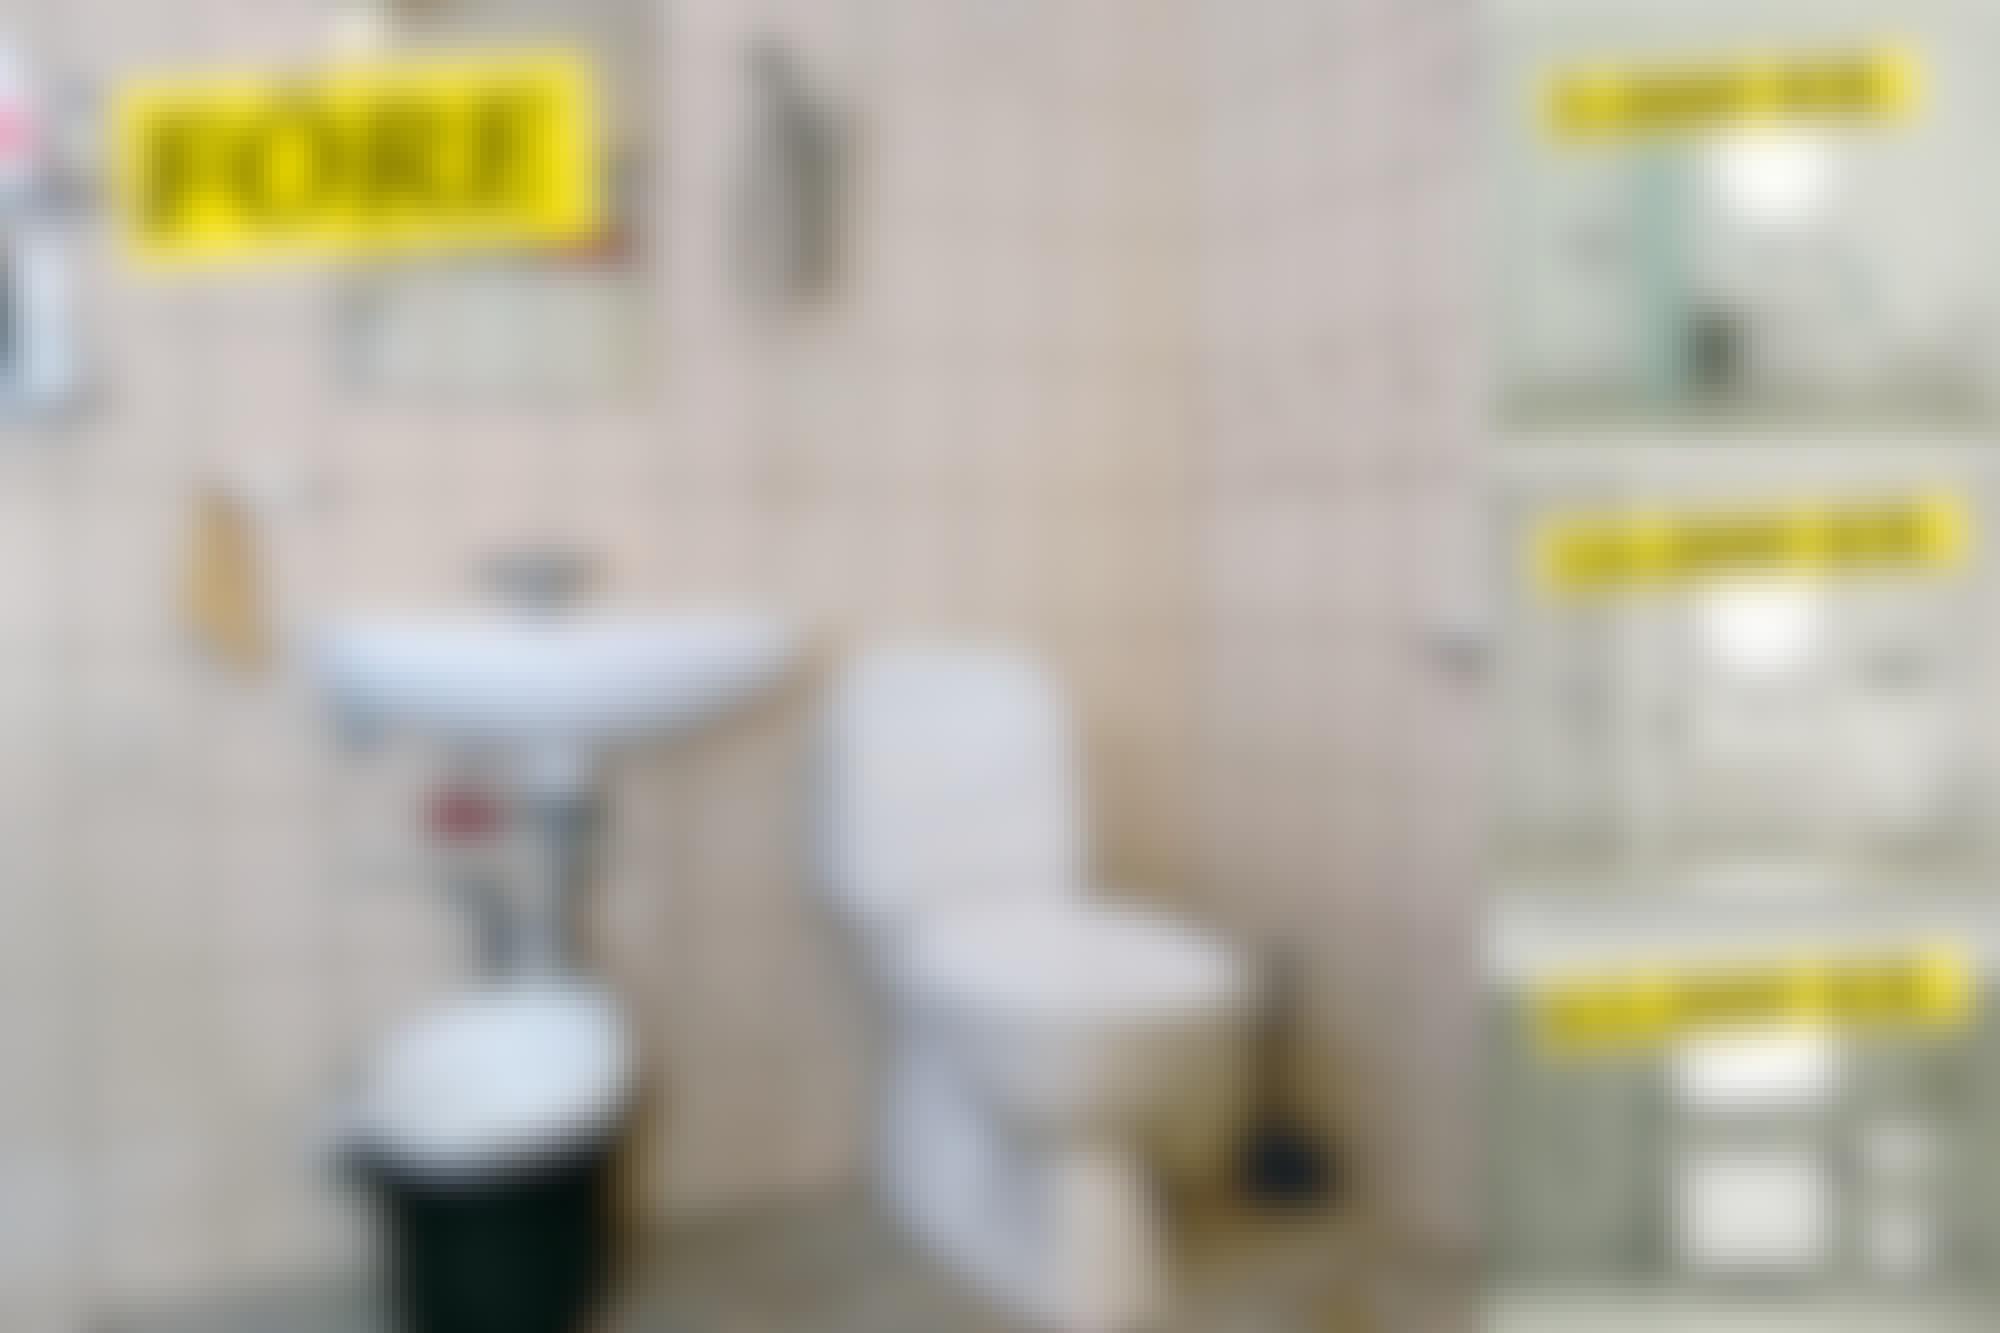 Nytt badrum - tre budgets